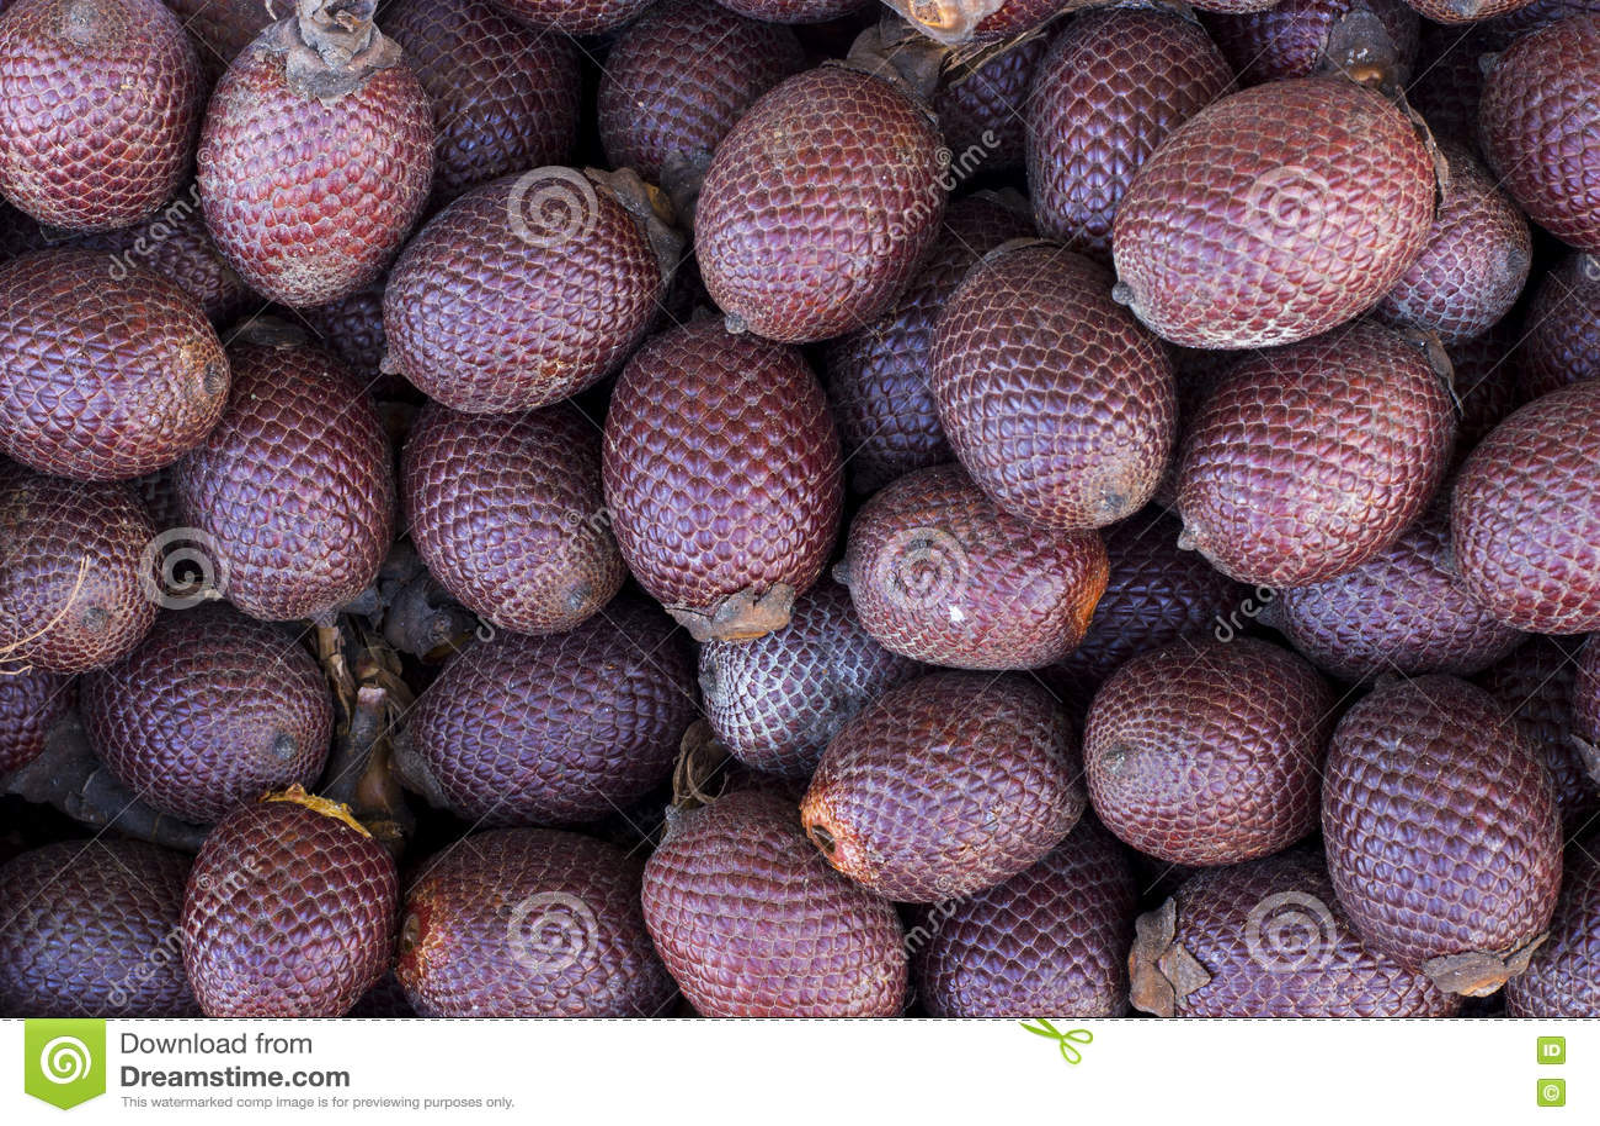 Exotisk frukt av Amerika: Aguaje eller Moriche, gömma i handflatan frukt, buritimuttrar, mauritiaflexuosaen, Maurity gömma i hand